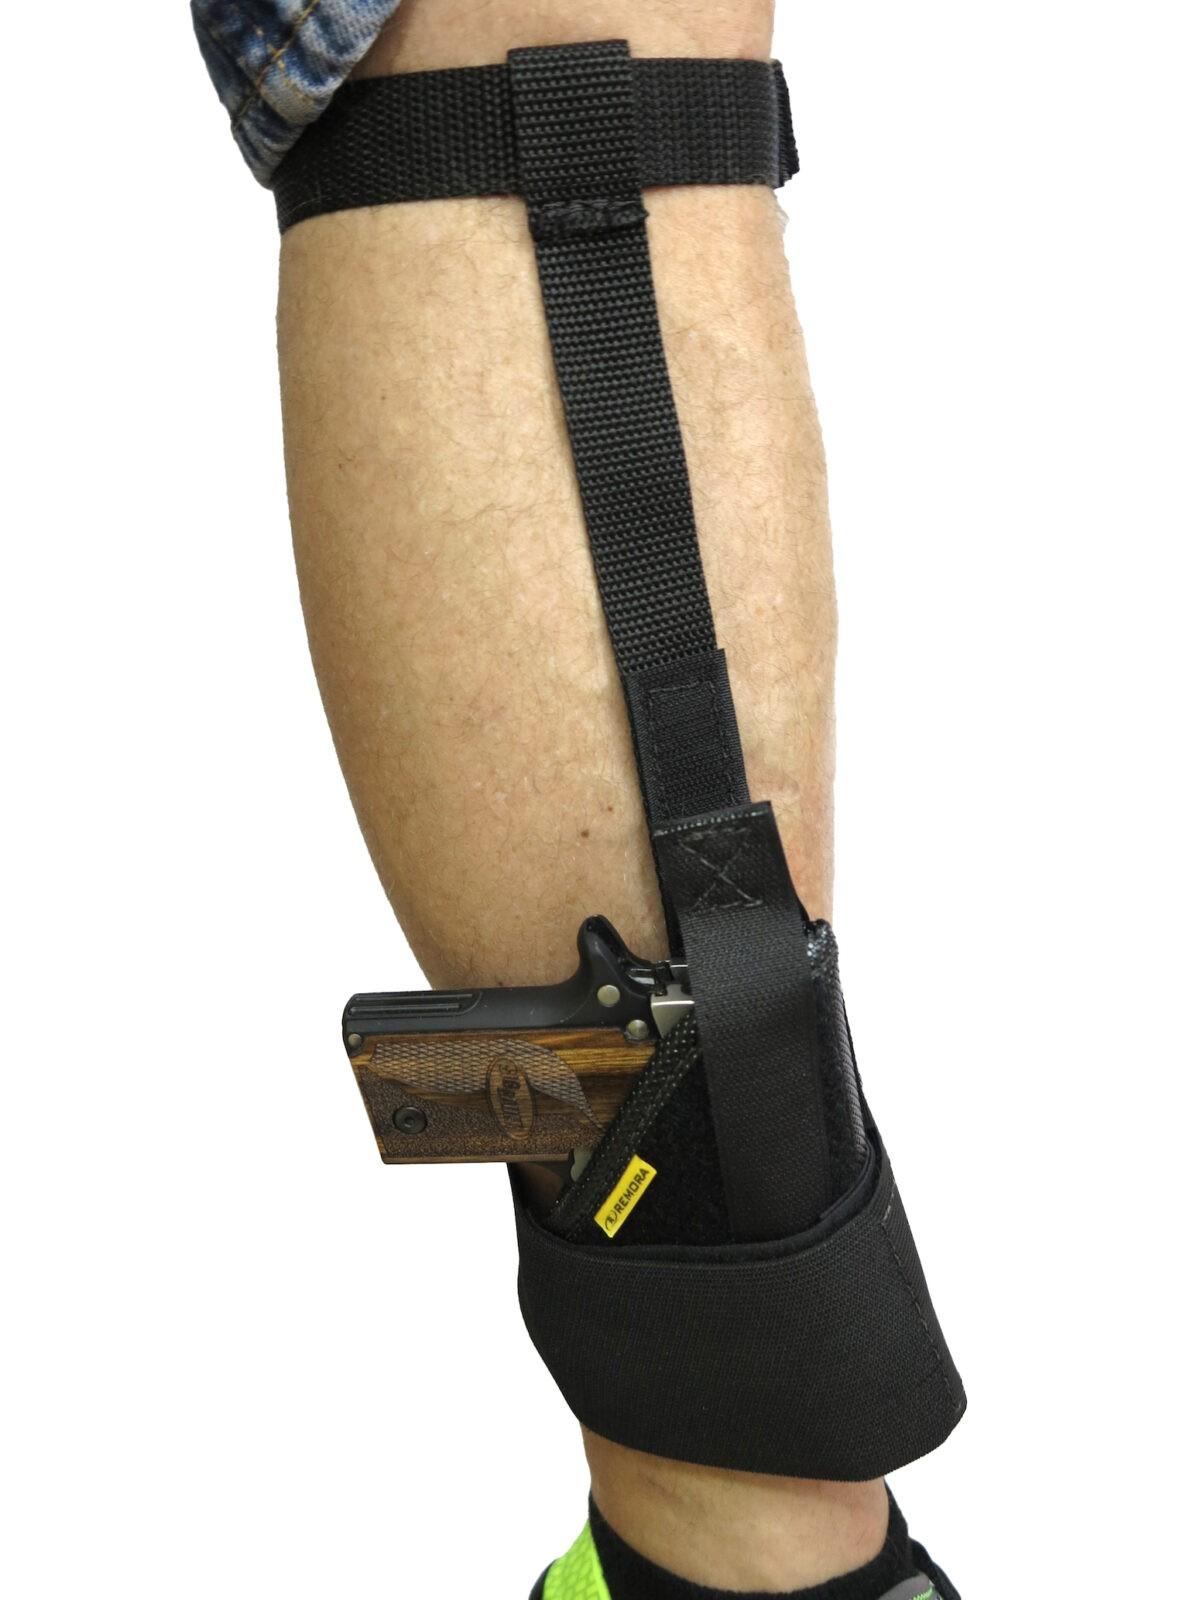 holster calf strap